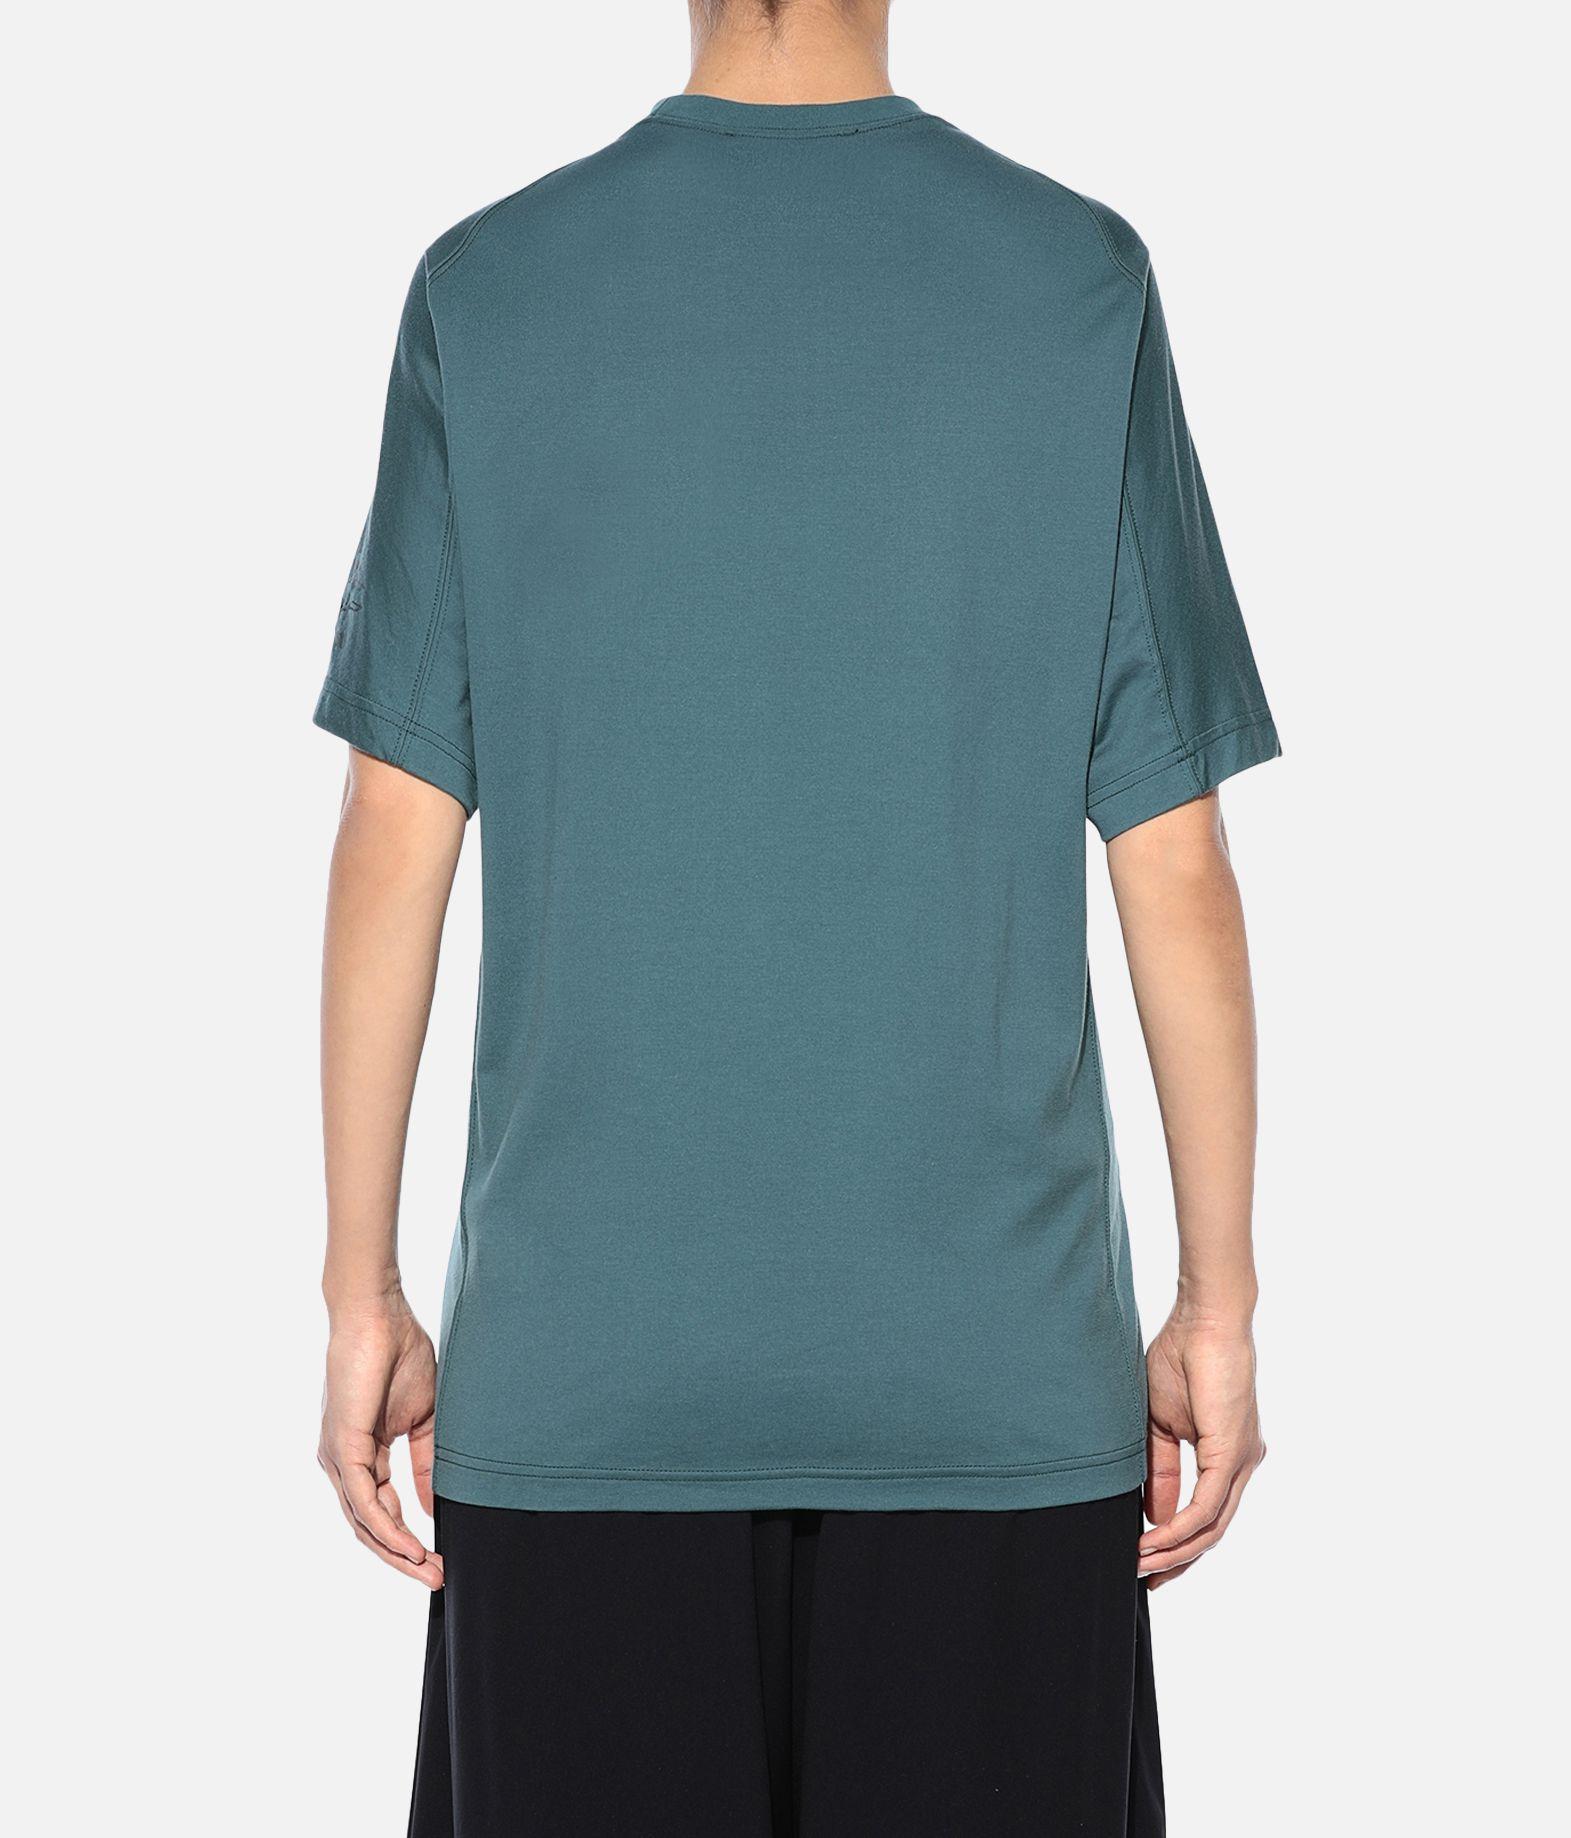 Y-3 Y-3 New Classic Tee  Kurzärmliges T-shirt Damen d